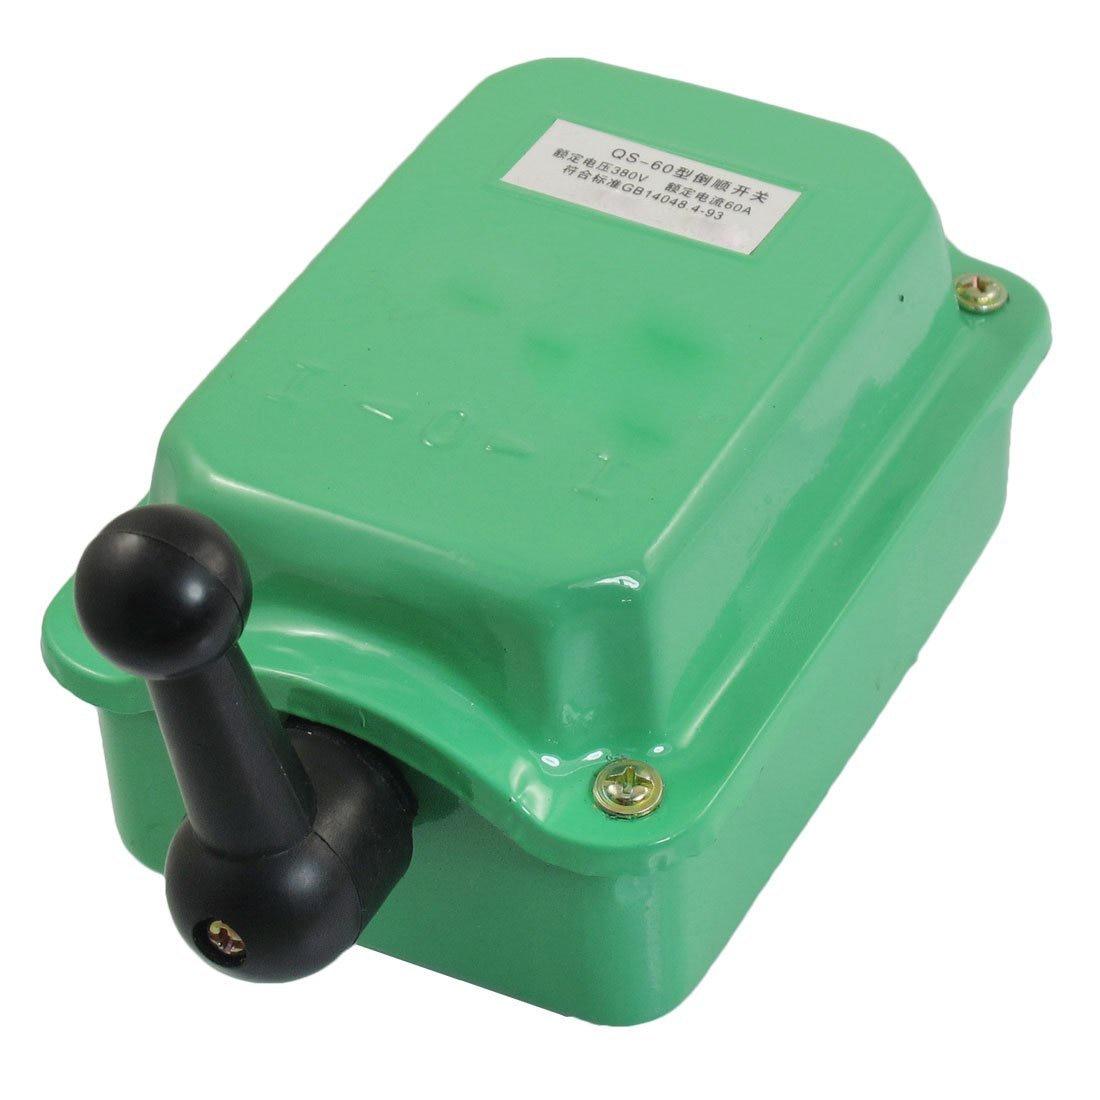 AC 380V 60A Forward Stop Reverse Motor Cam Starter Changeover Switch QS-60 GreenAC 380V 60A Forward Stop Reverse Motor Cam Starter Changeover Switch QS-60 Green